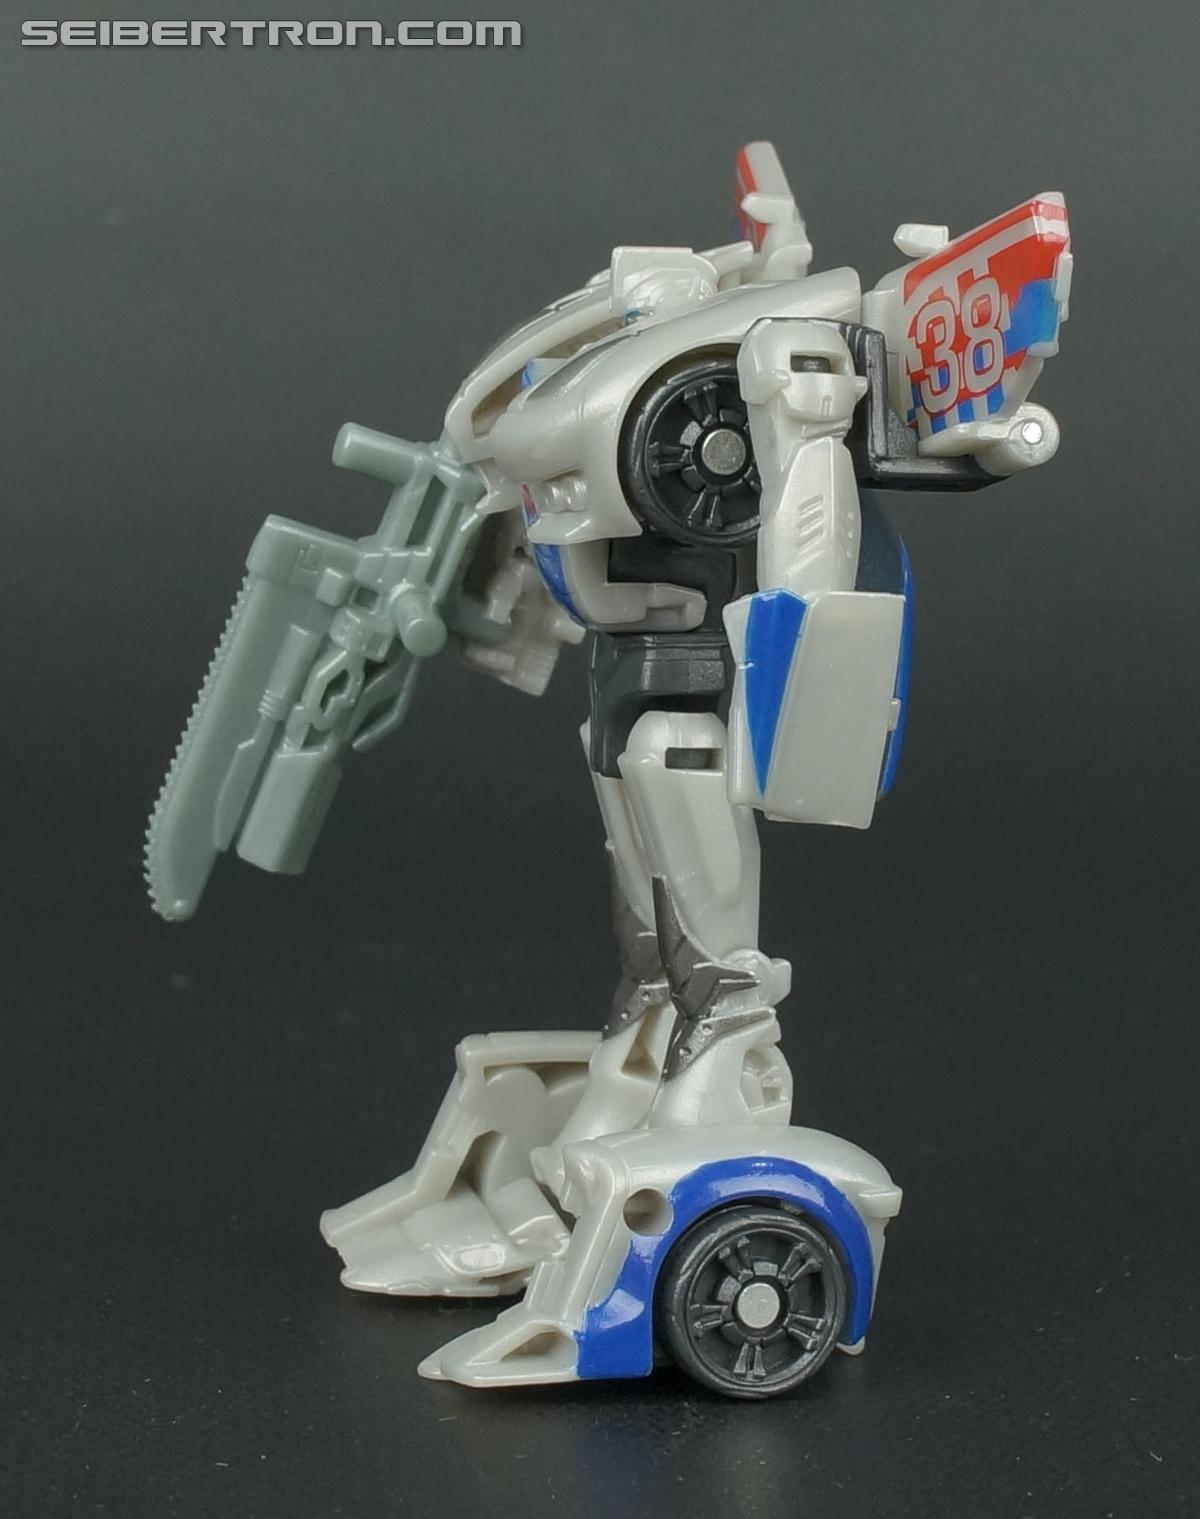 Transformers Prime Beast Hunters Cyberverse Smokescreen (Image #57 of 93)